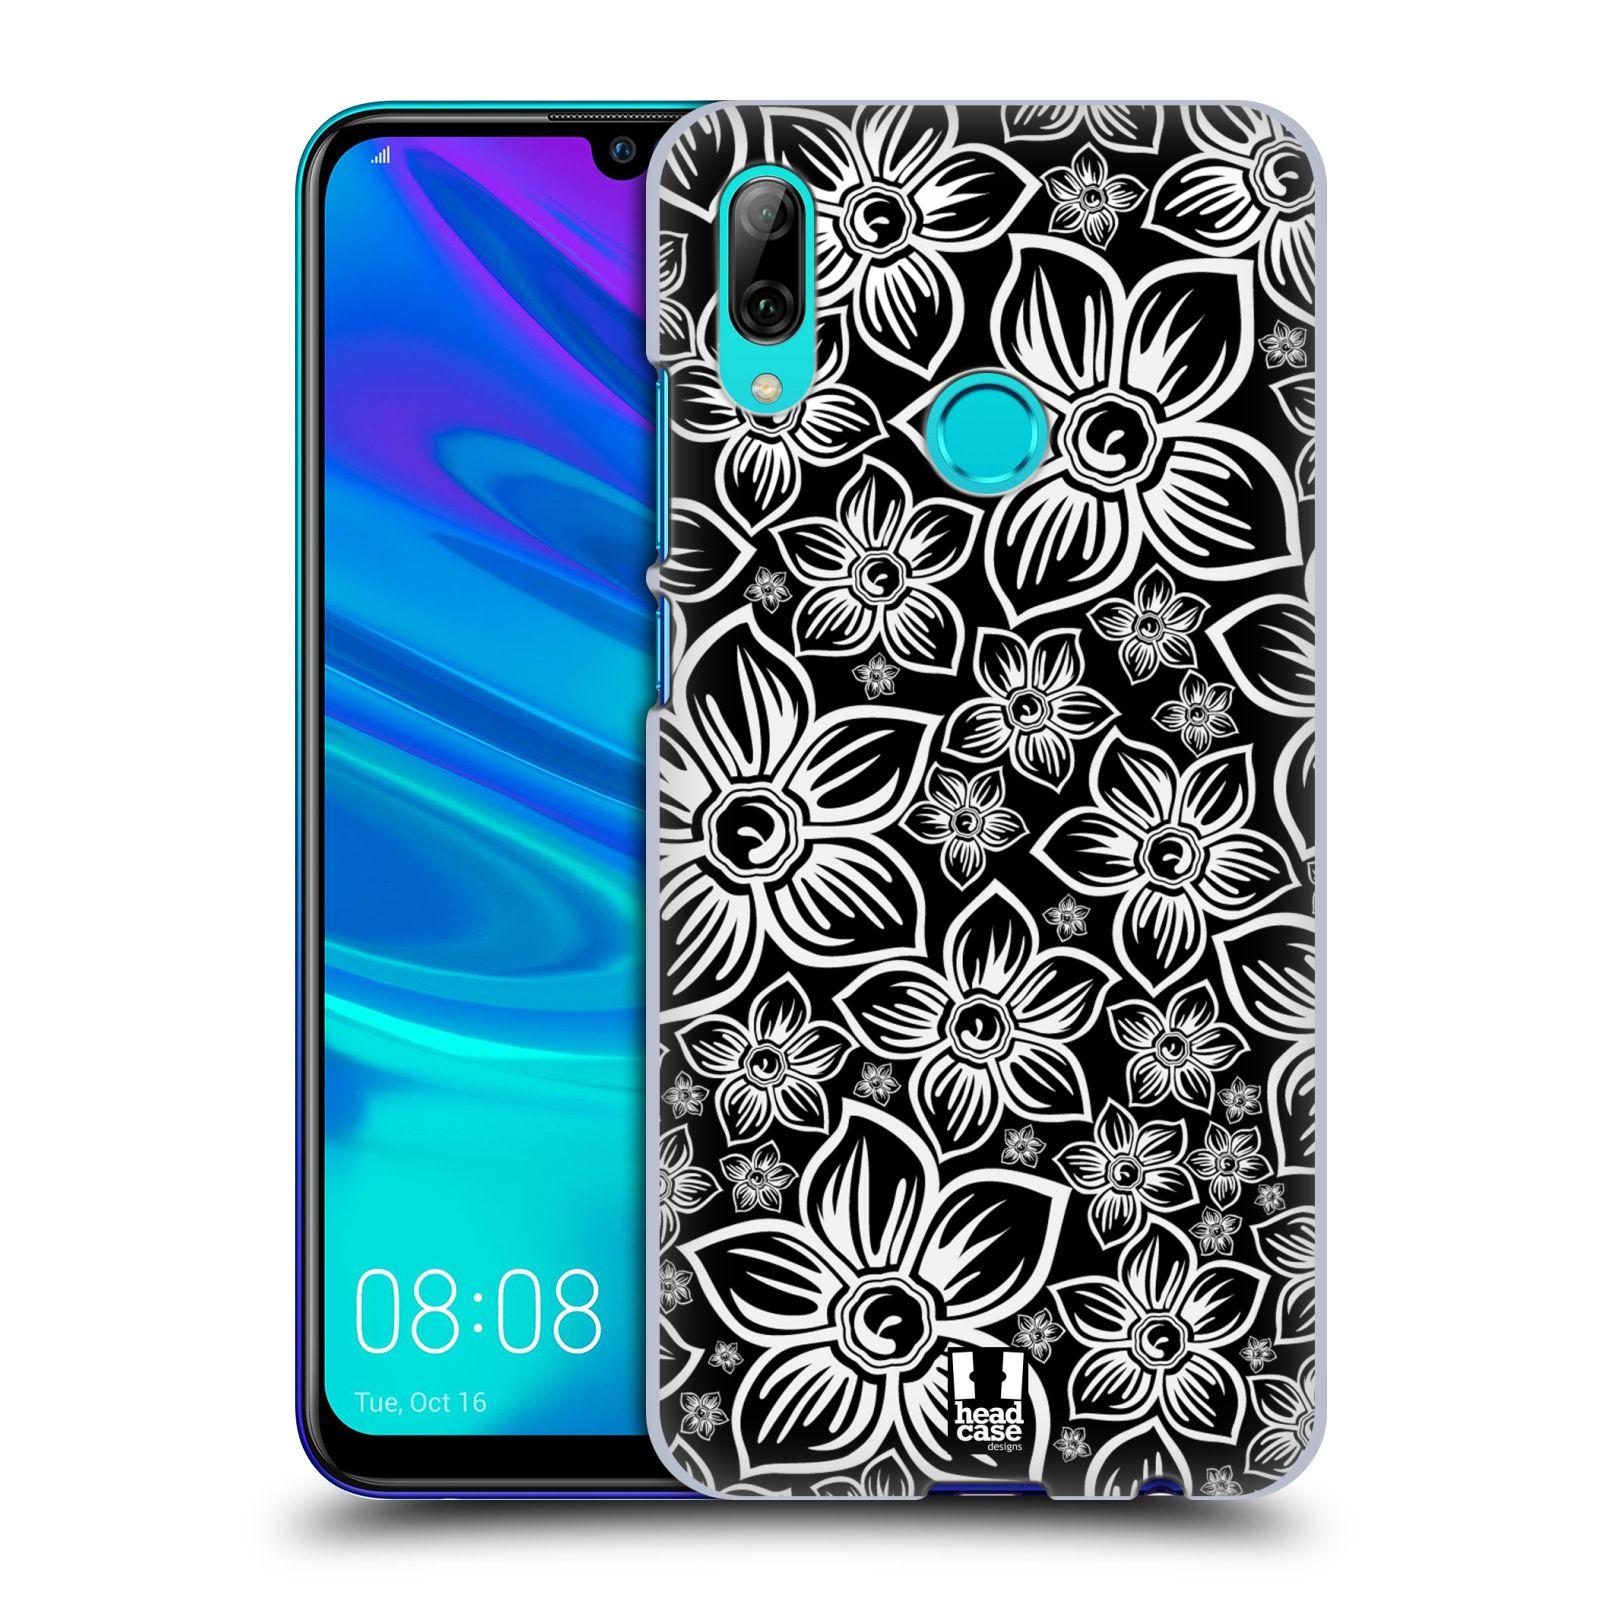 Plastové pouzdro na mobil Huawei P Smart (2019) - Head Case - FLORAL DAISY